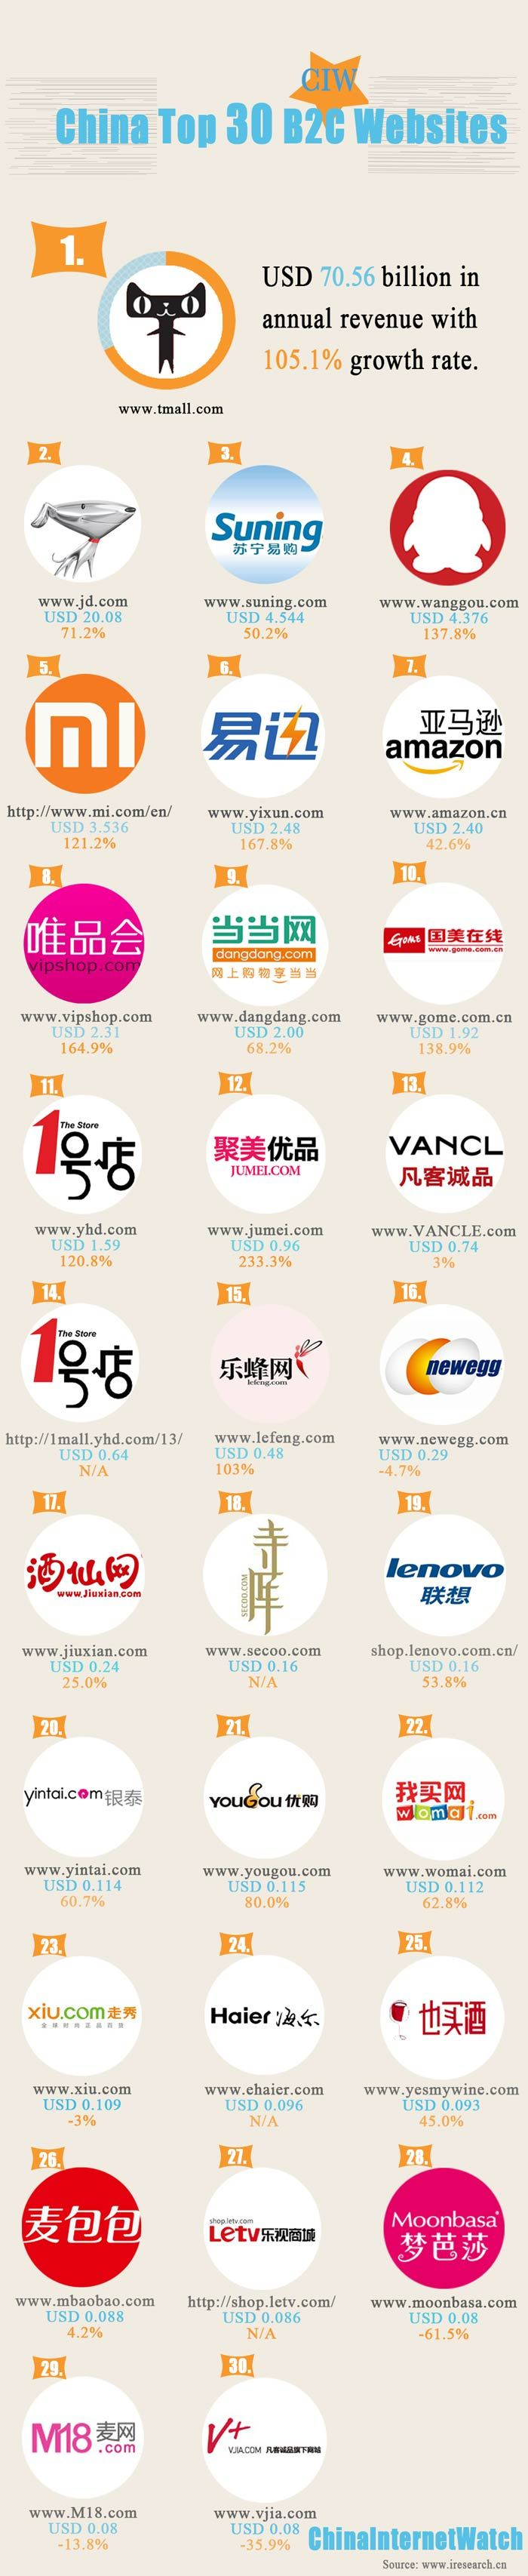 INFOGRAPHIC: China's Top 30 B2C Websites